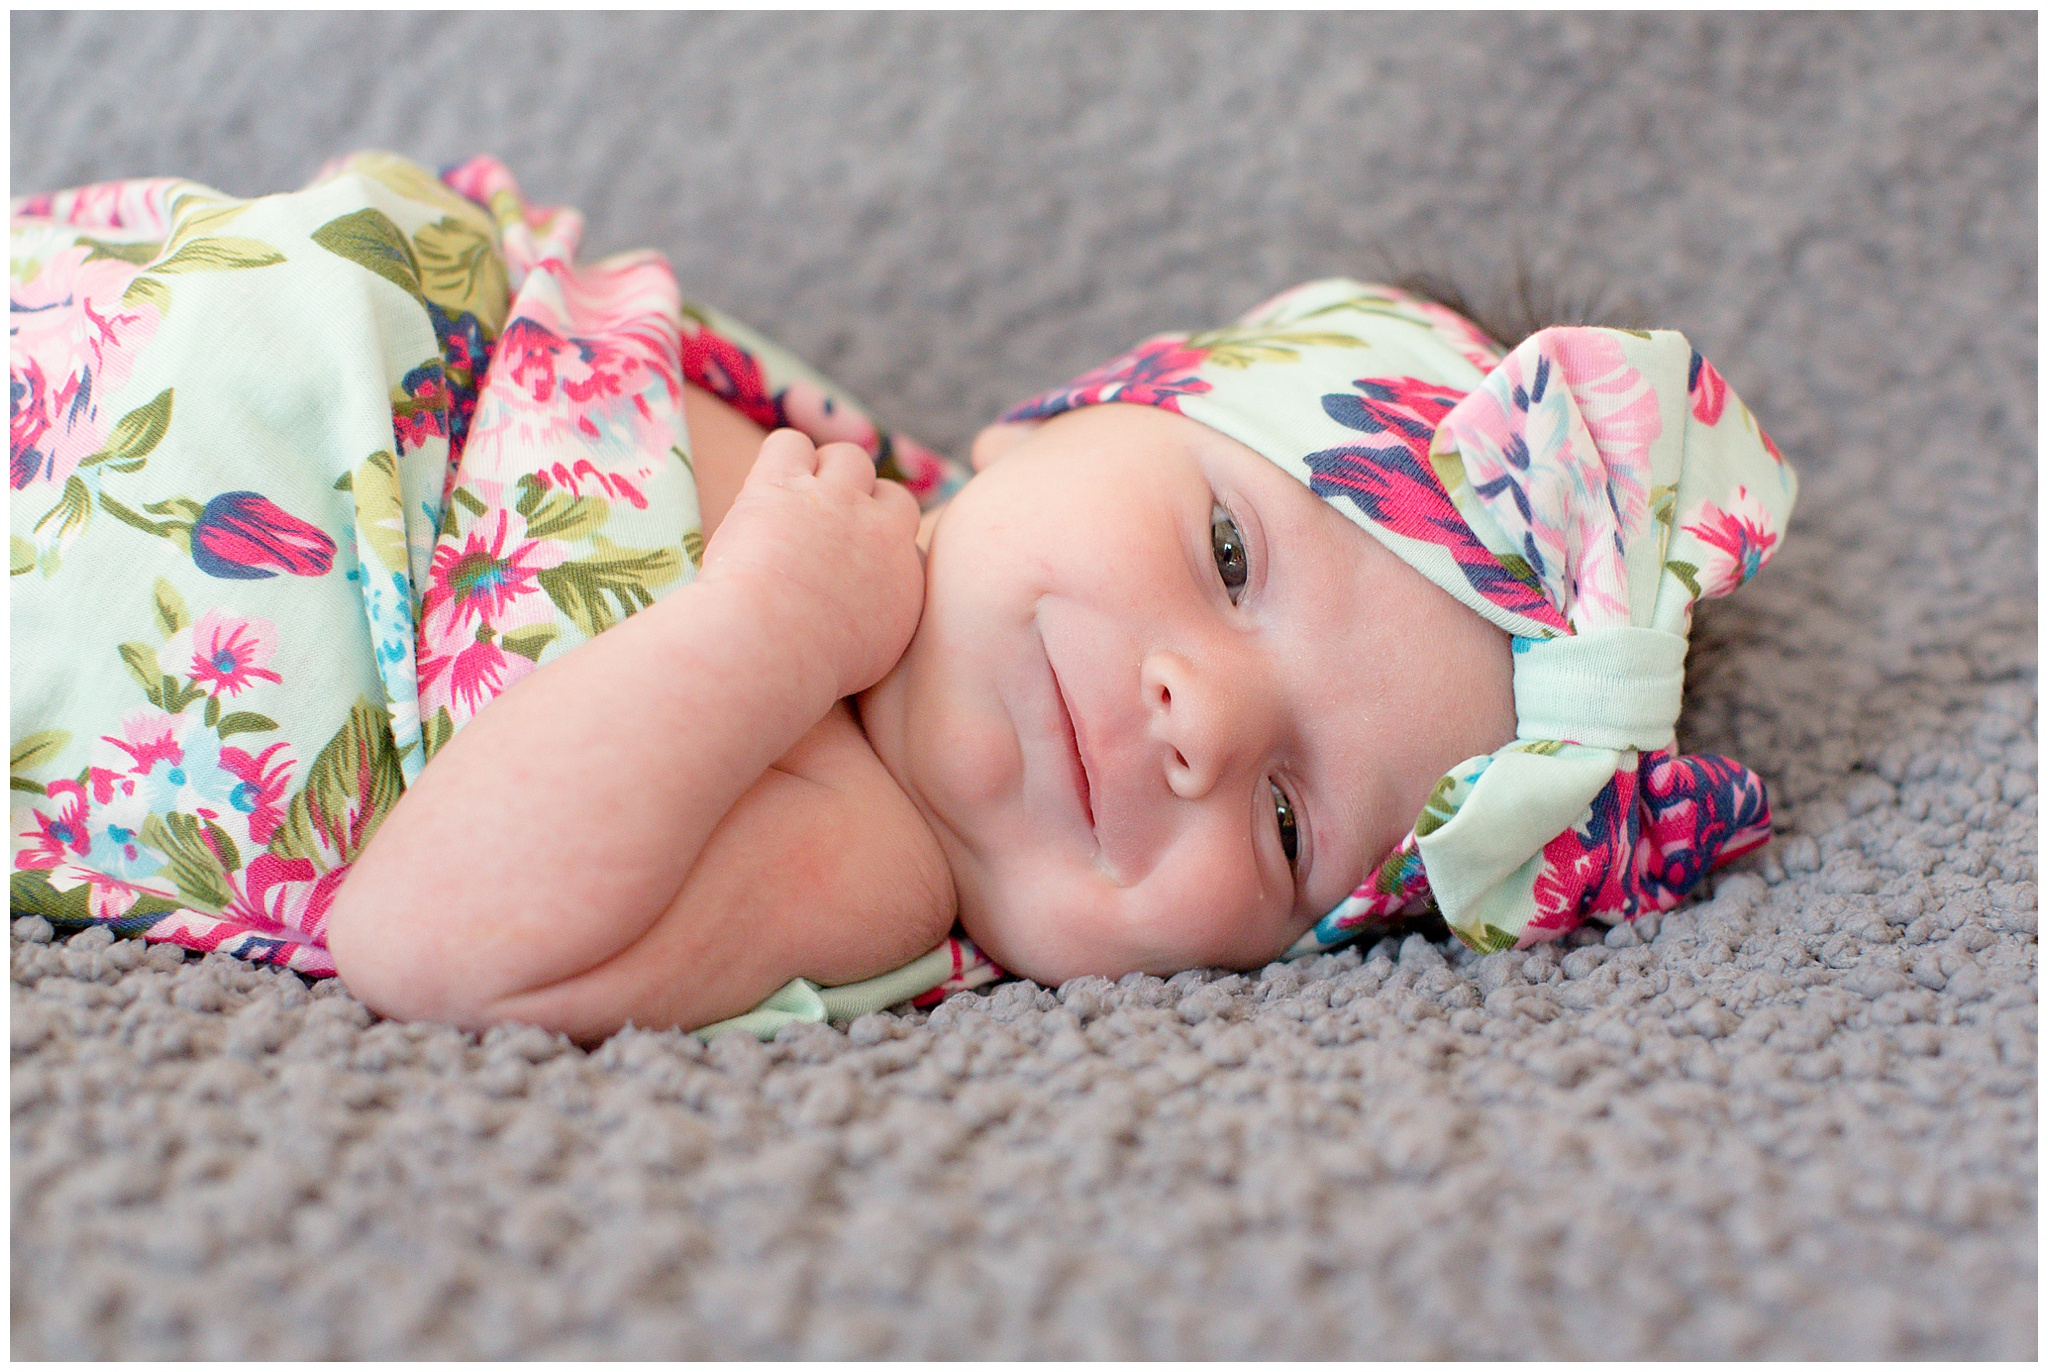 baby-Norah_0001.jpg